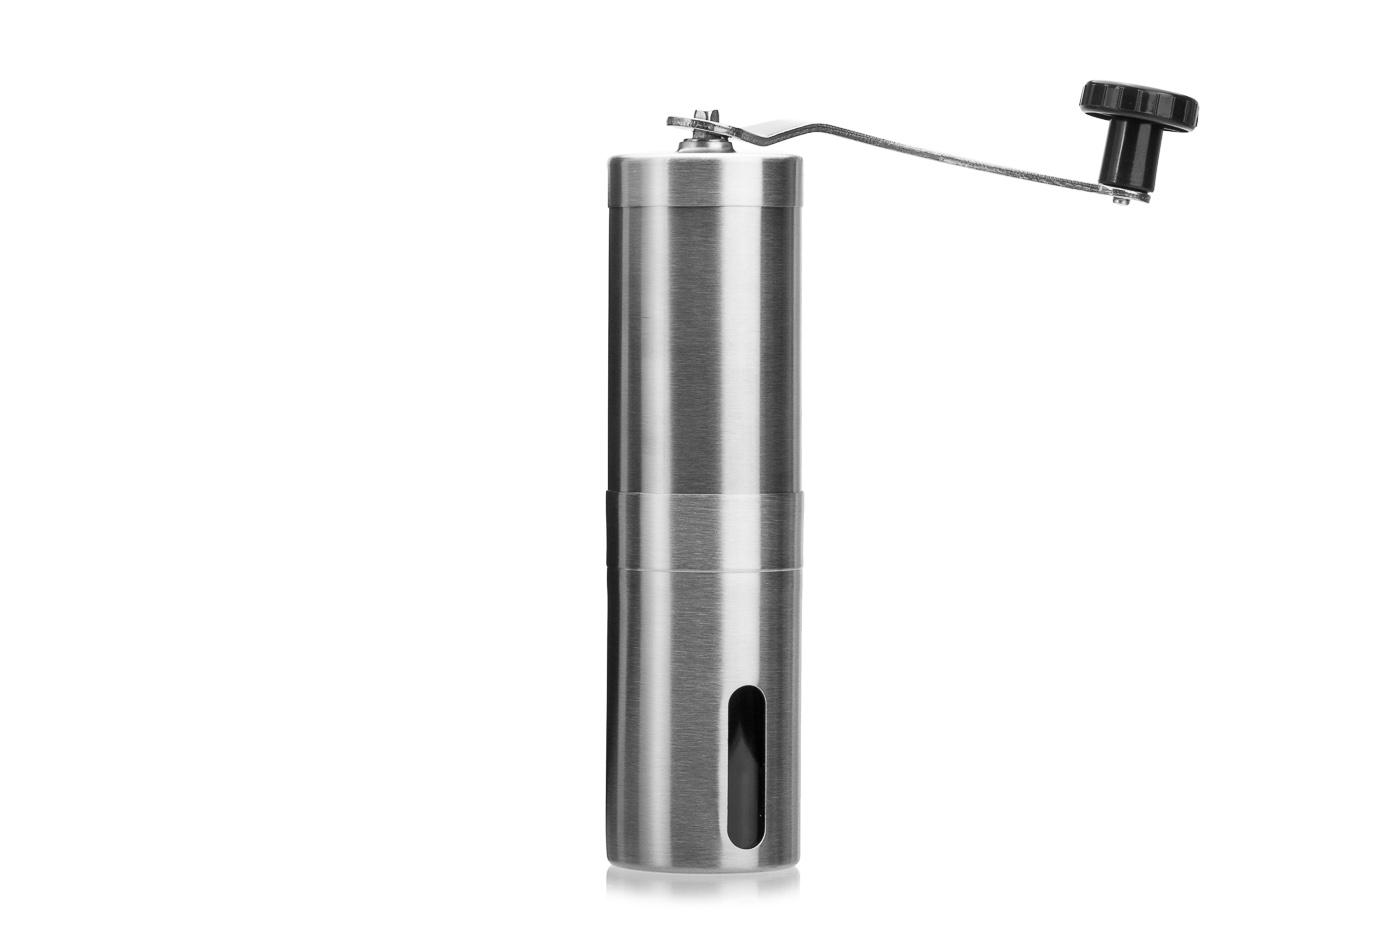 2c3196181 GrinderLand - ručný mlynček na kávu | ManuCafe.sk